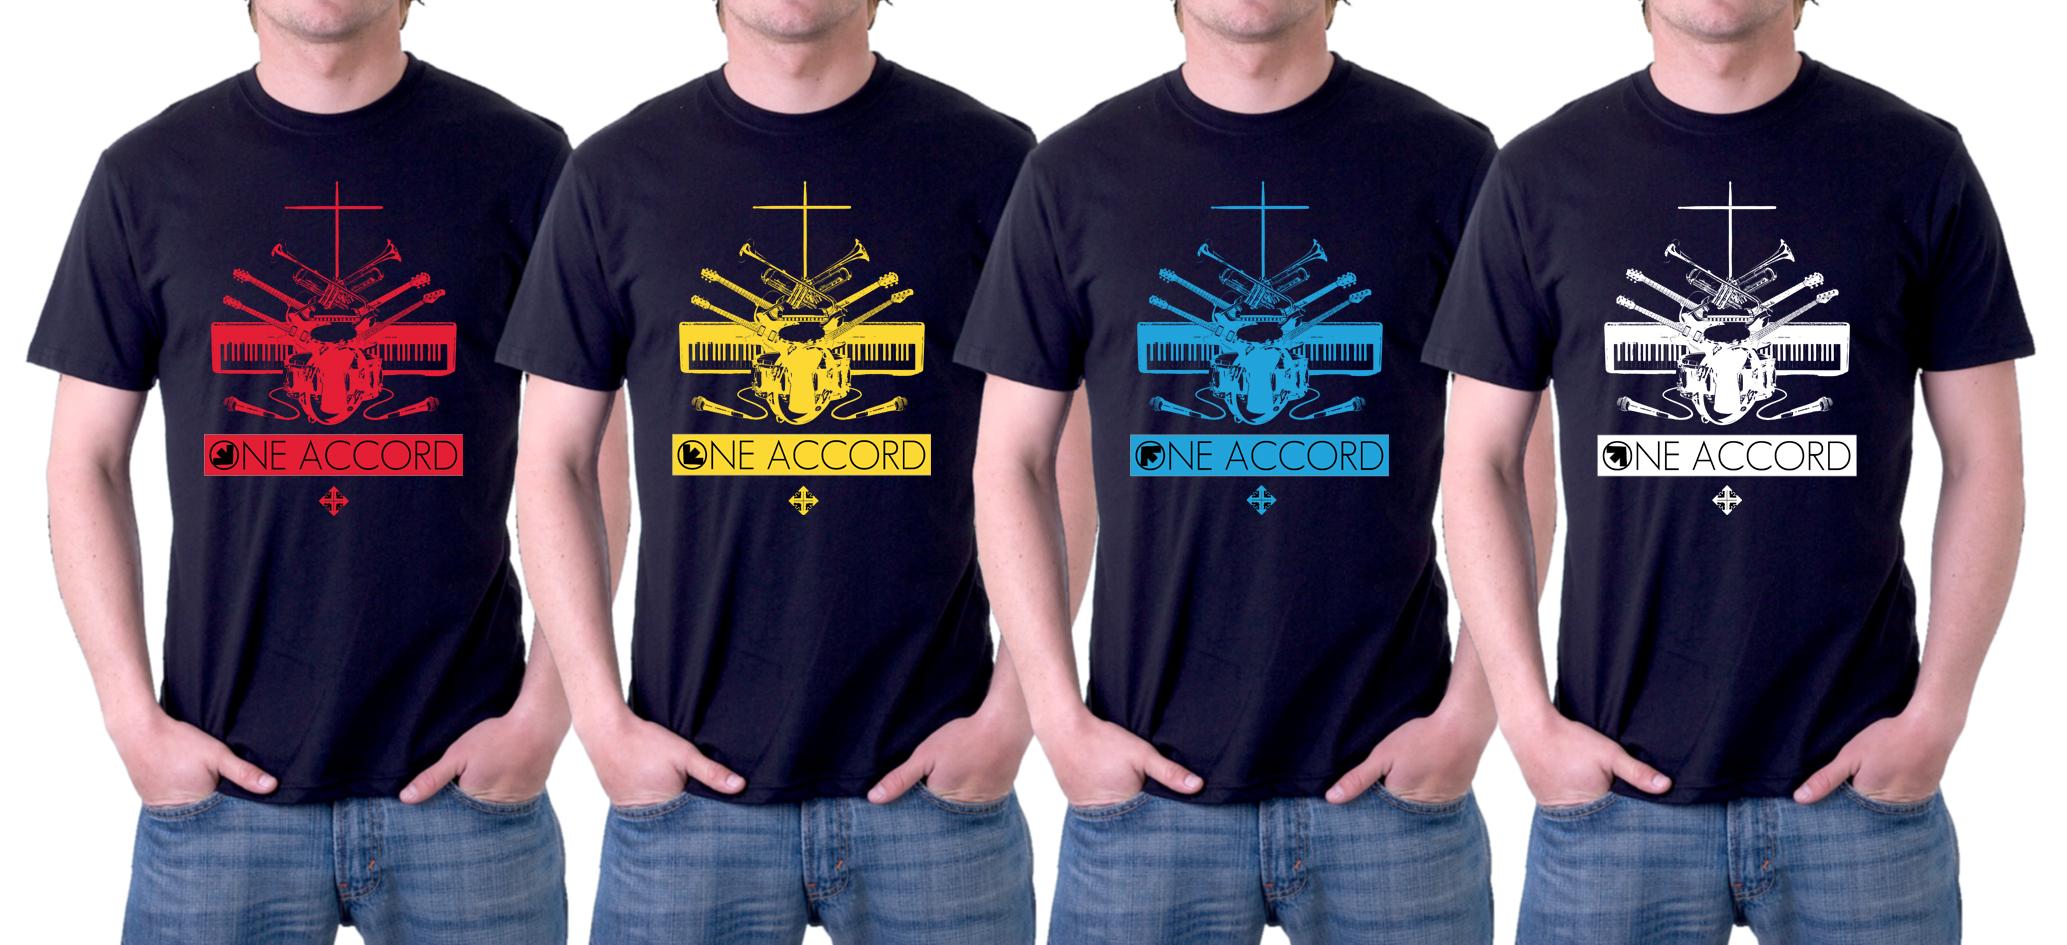 t-shirt-models